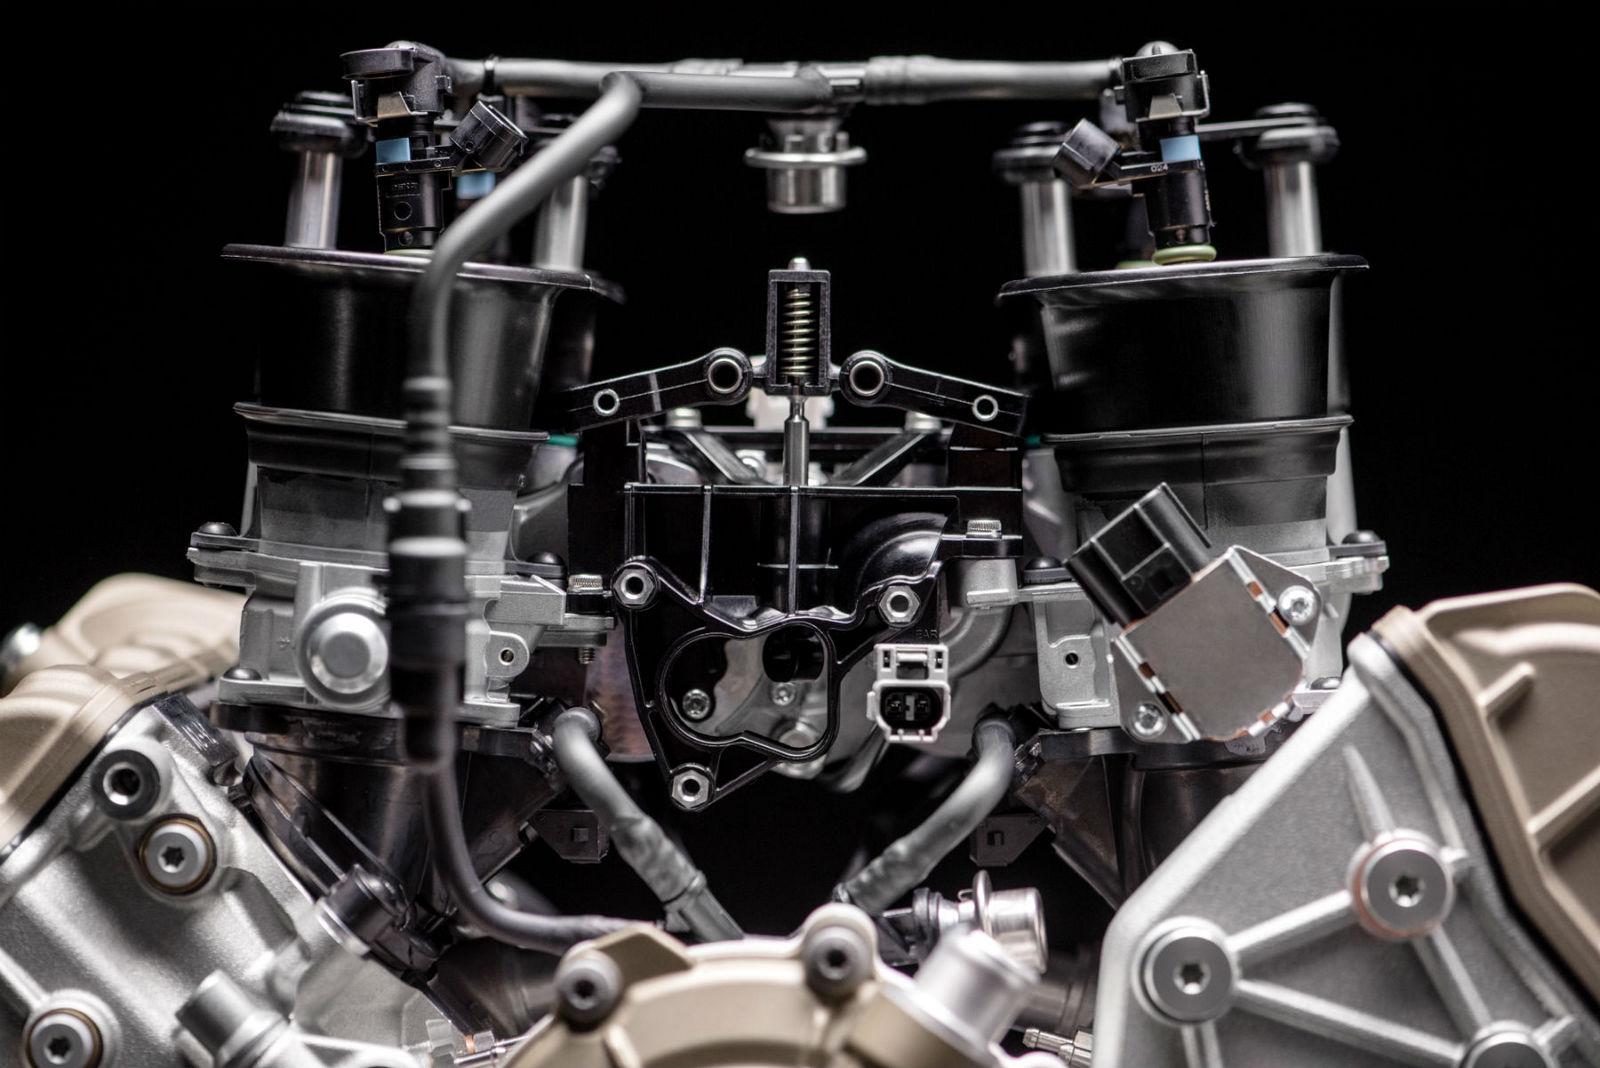 ducati-v4-engine-3